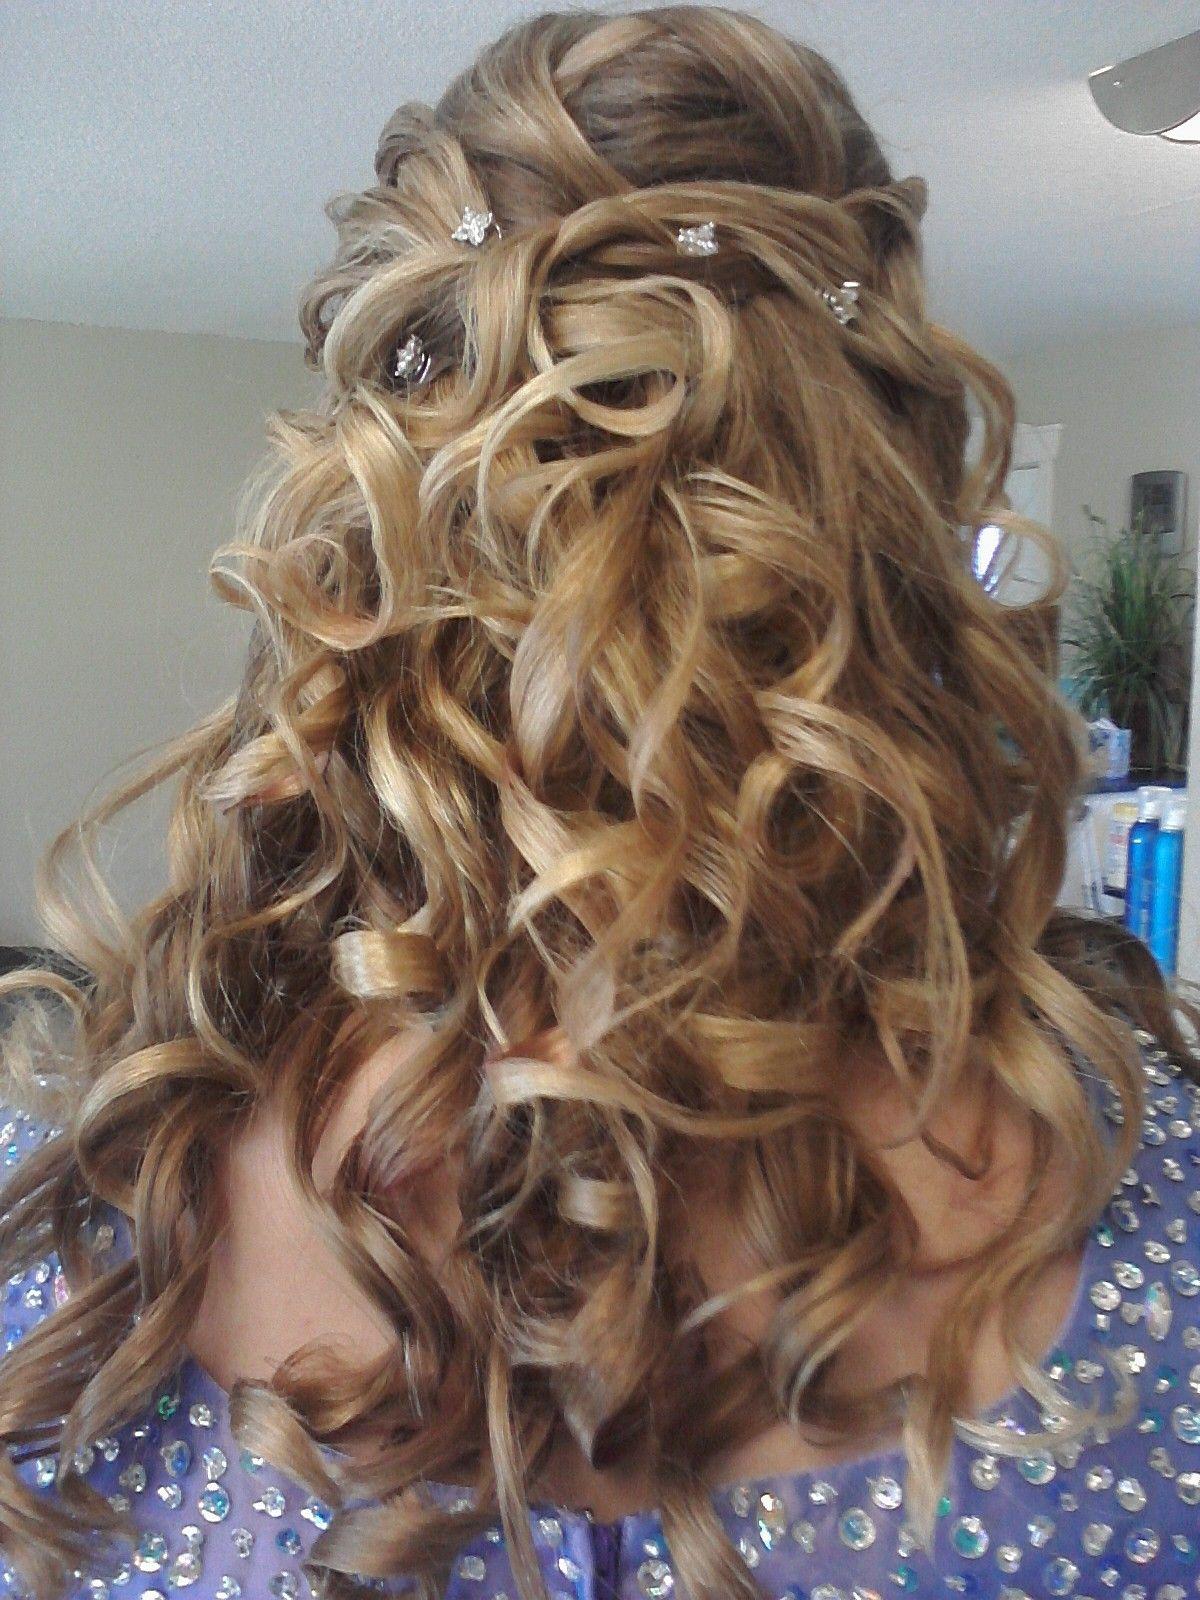 Pin By Desirae M Weeks On Mine Dance Hairstyles Graduation Hairstyles Long Hair Styles